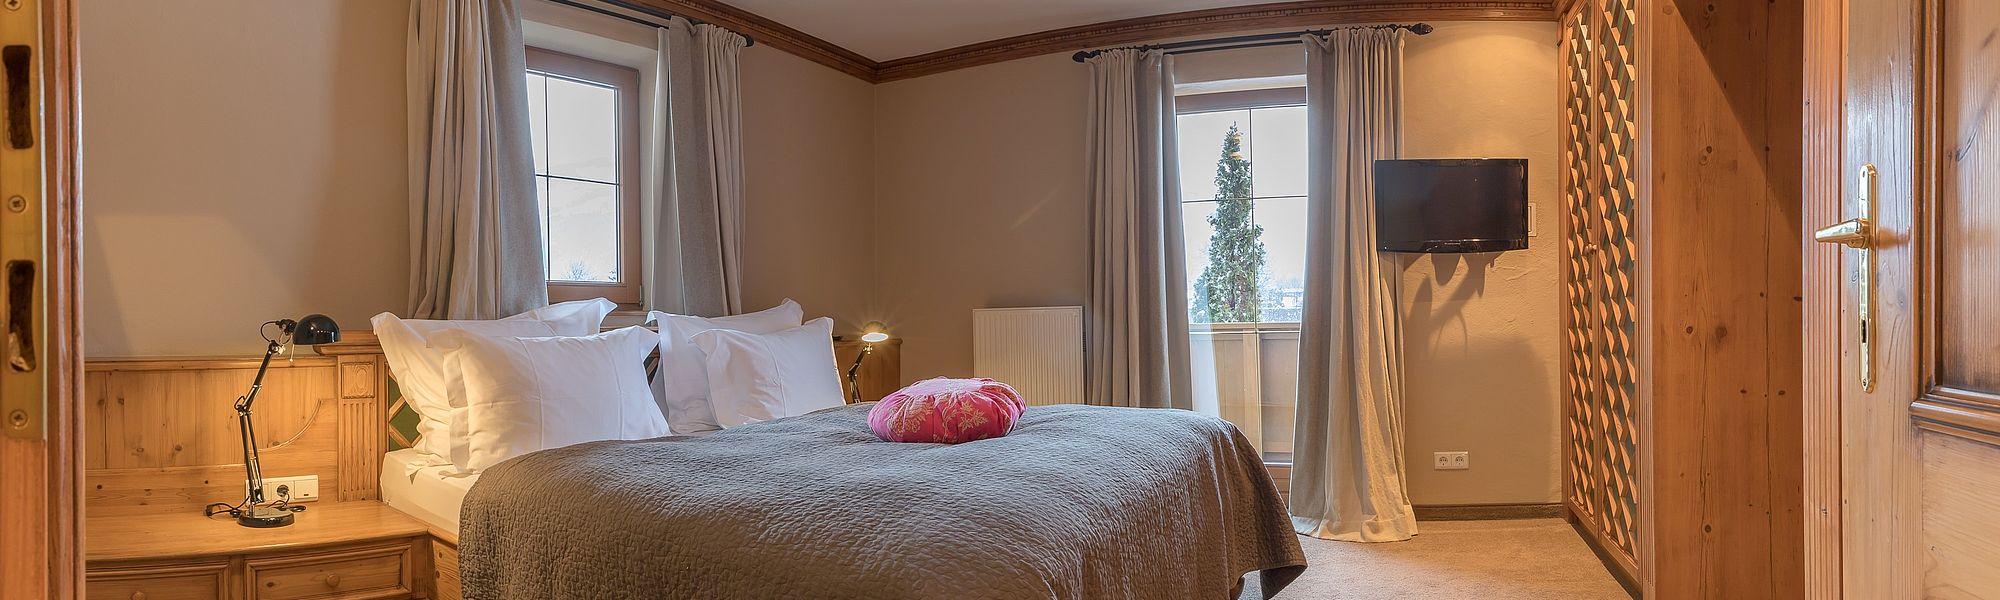 RelaxSuite 203 in Villa Haidacher